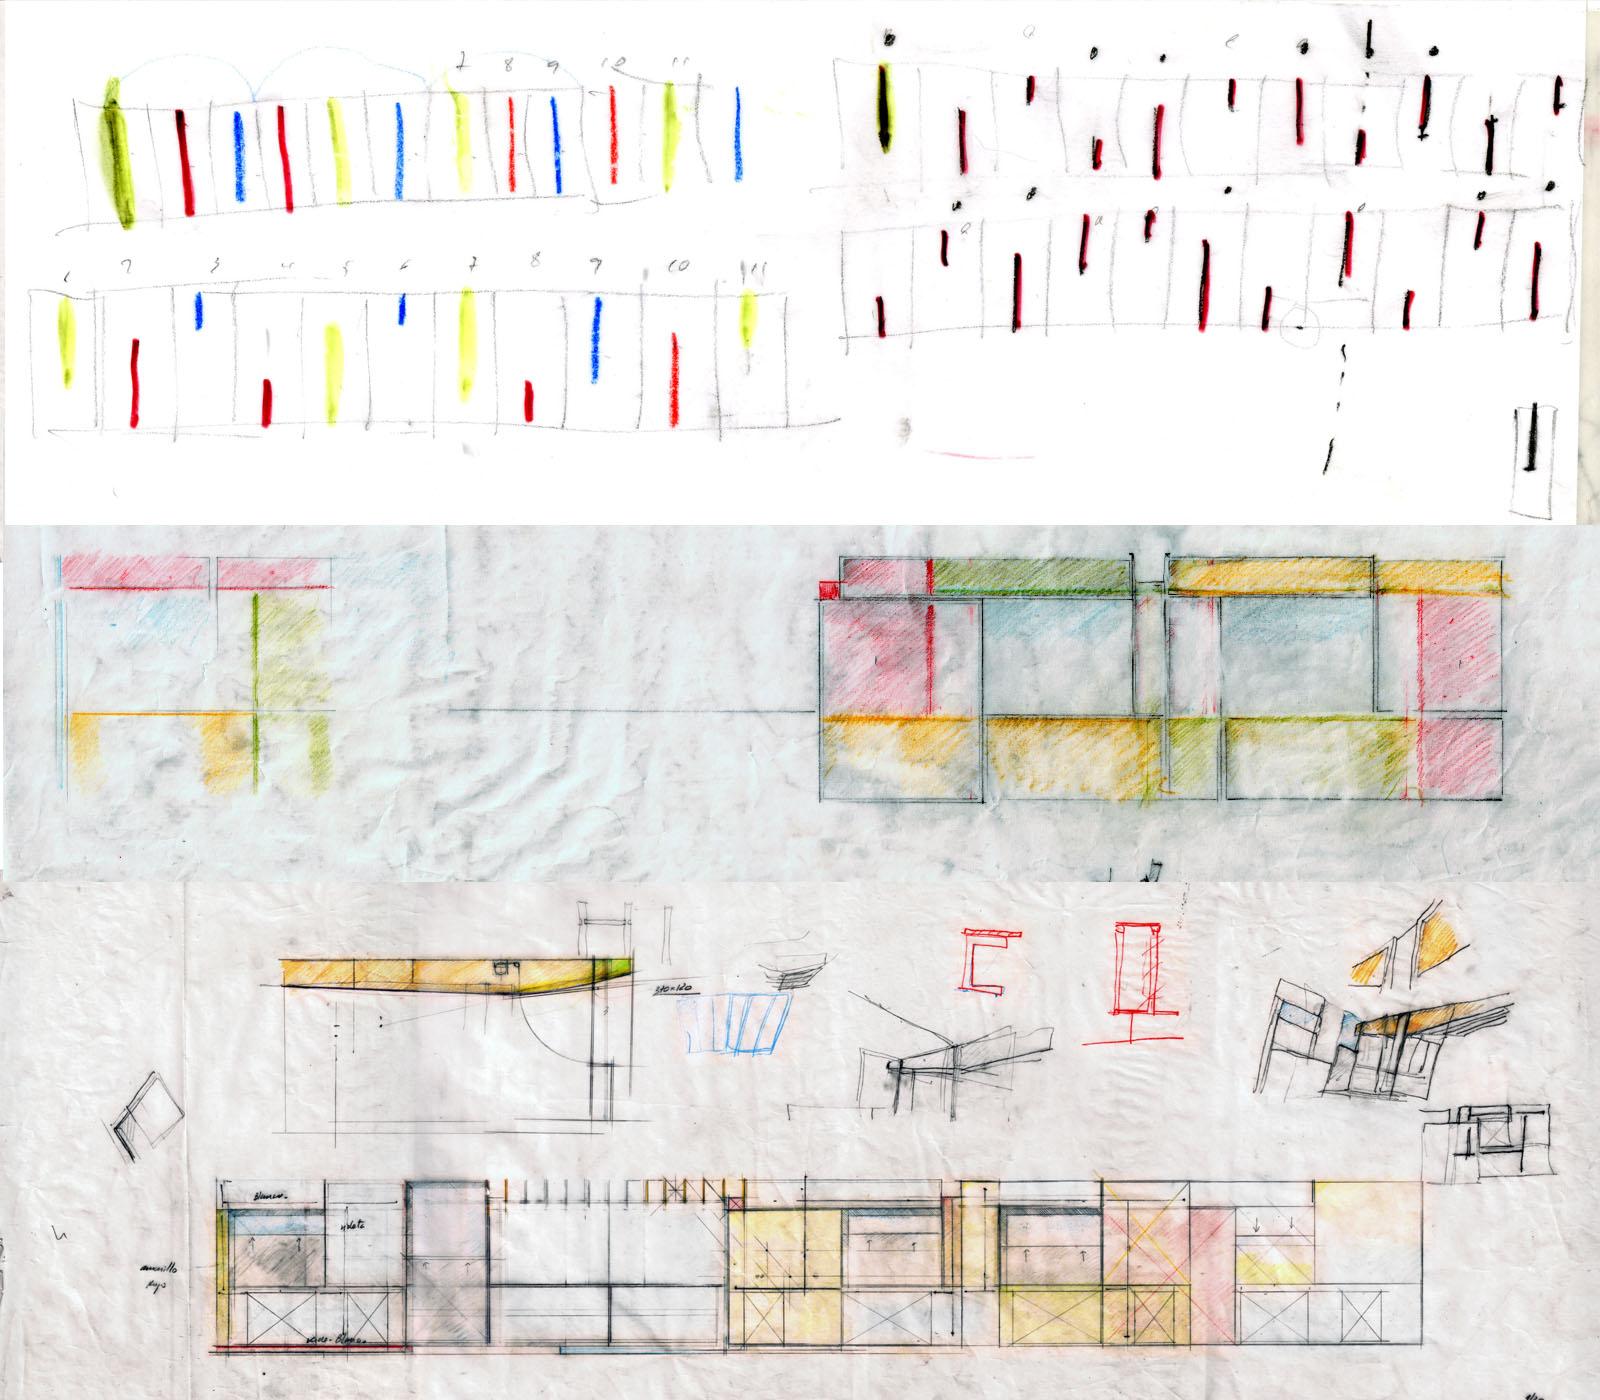 danielvillalobos-architecturexxithcentury-spanisharchitecture-3.2